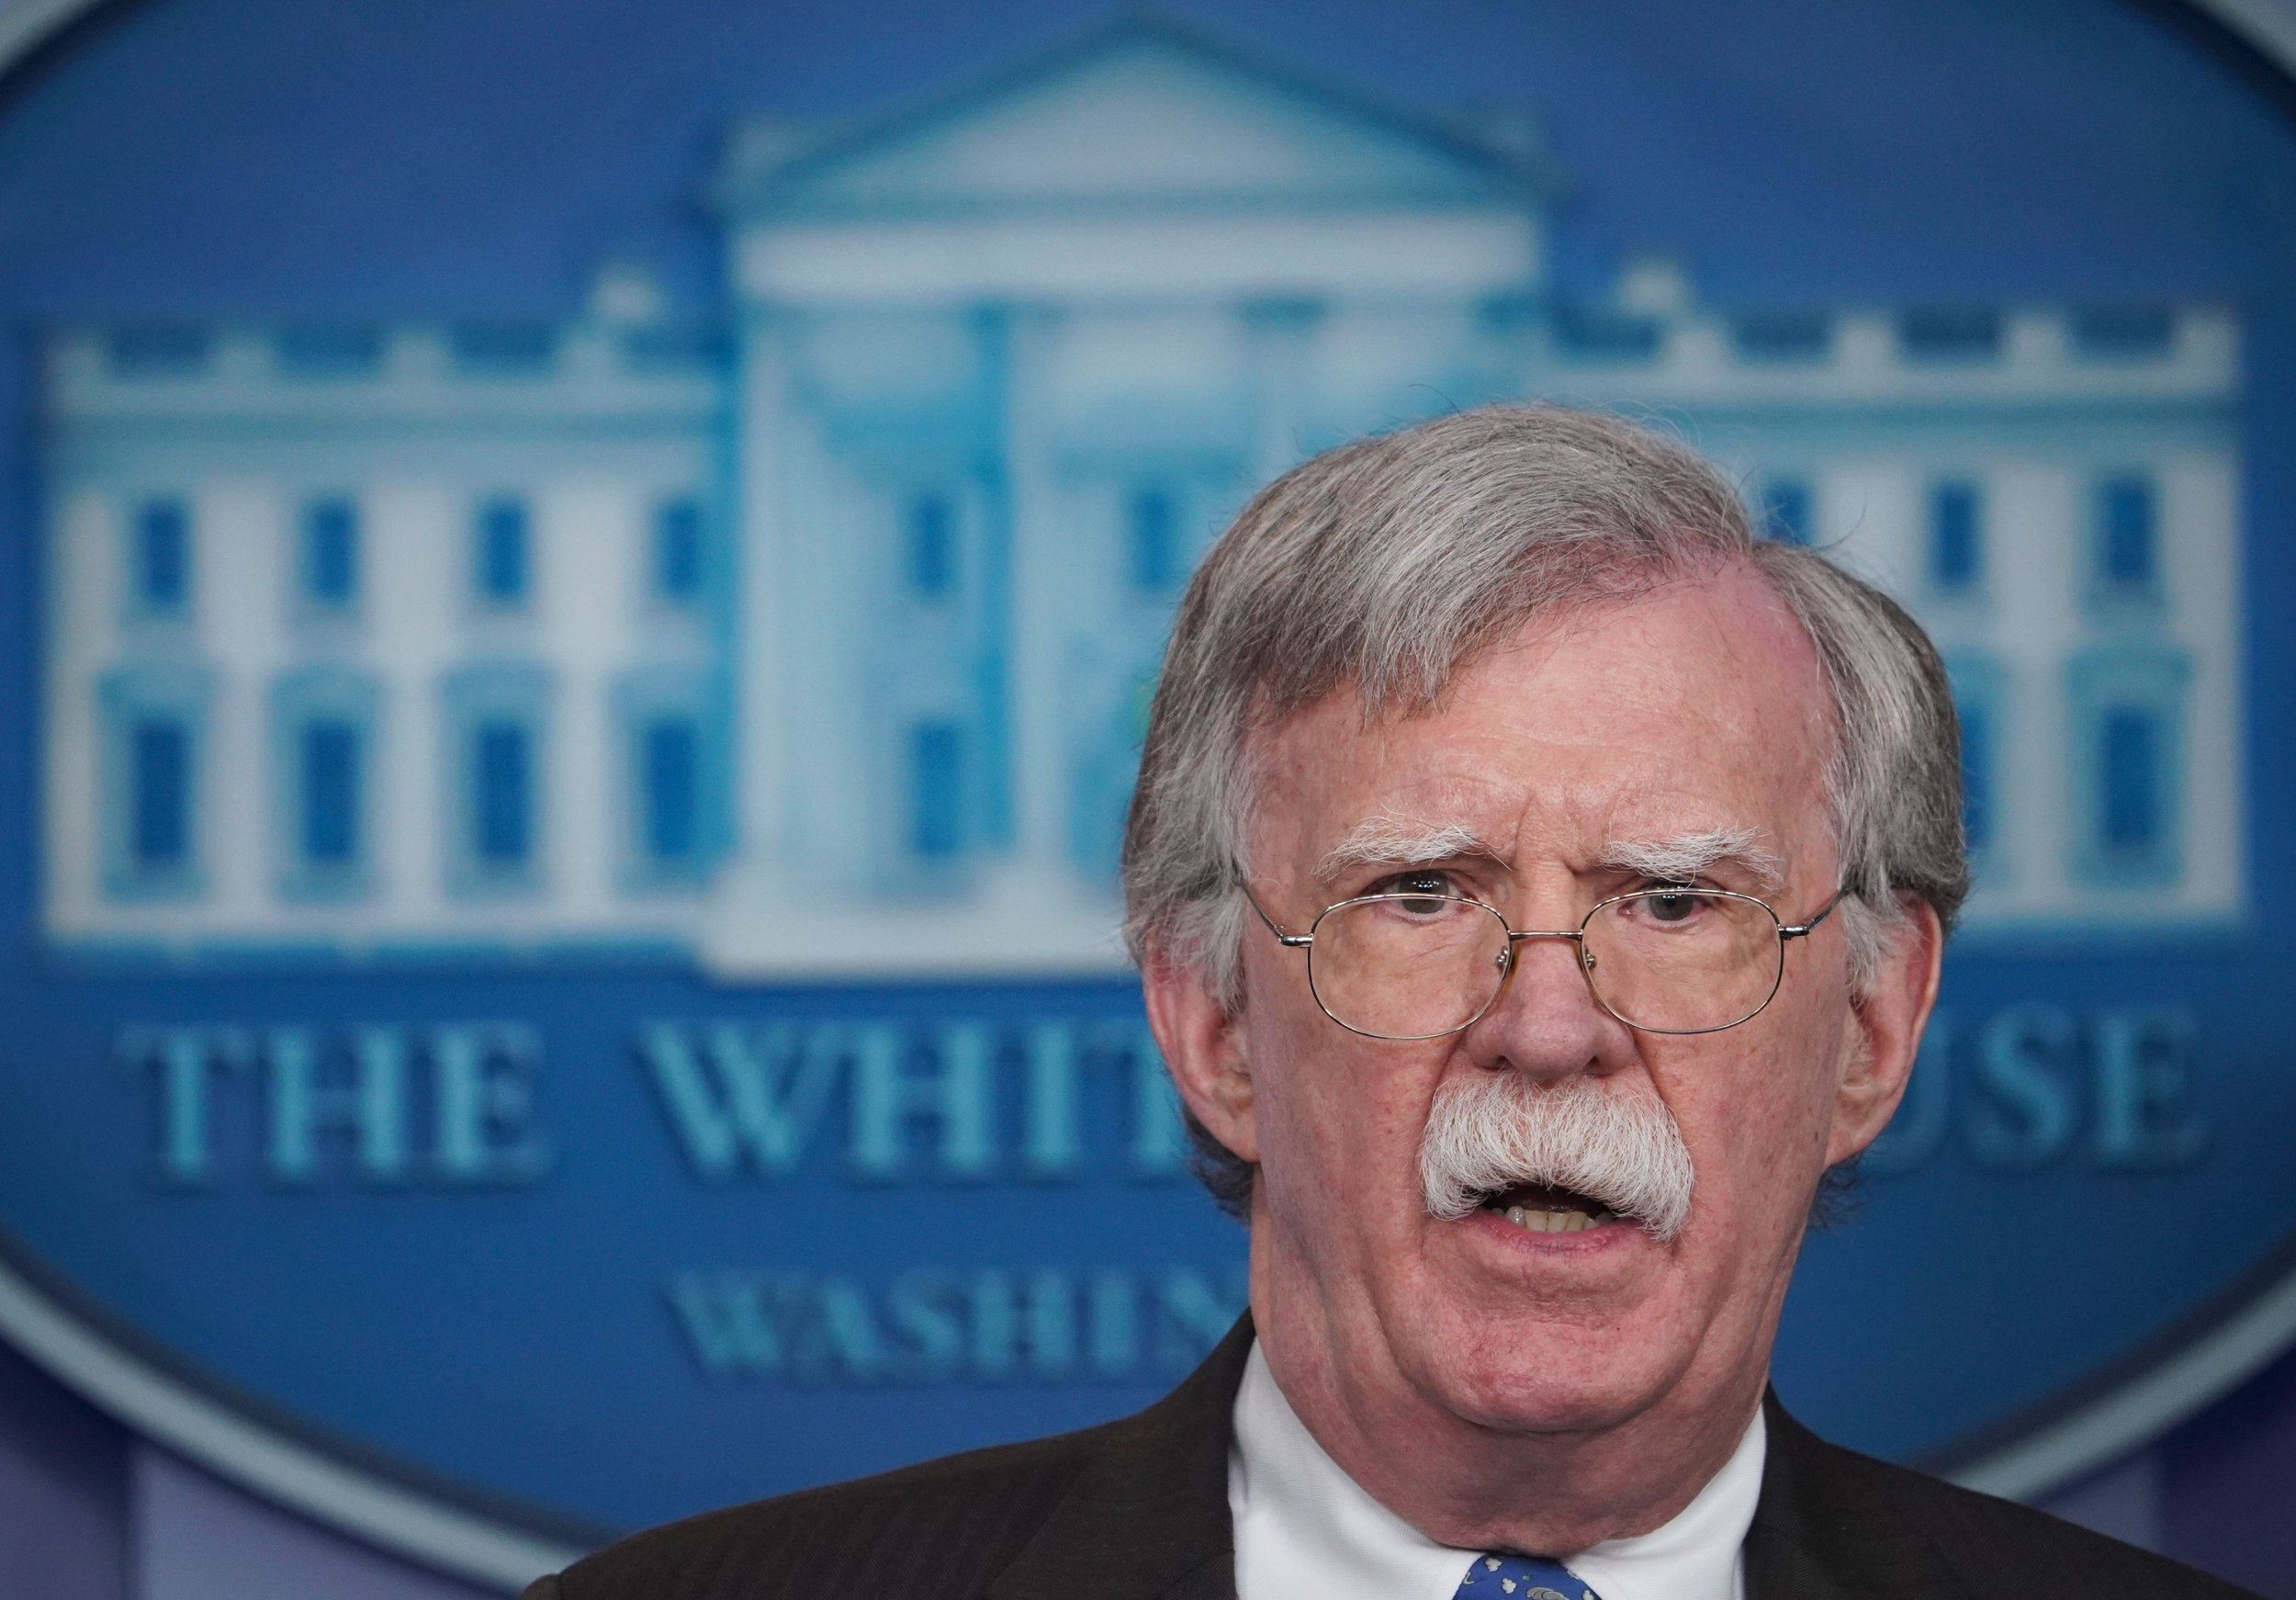 iran, bolton, suffering, psychosis, threat, trump